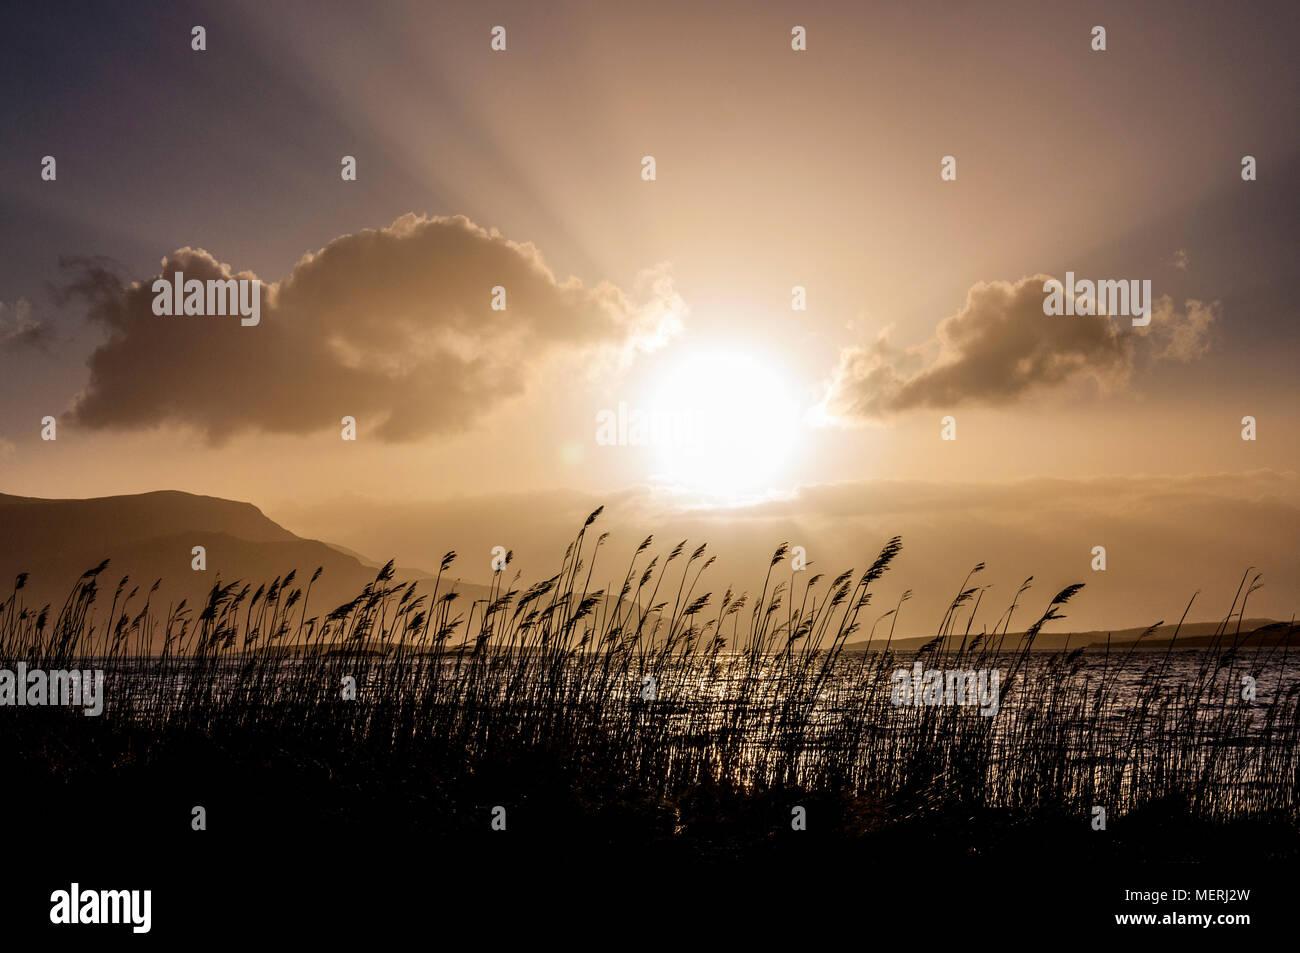 Sun goes down on Ireland's west coast 'Wild Atlantic Way' County Donegal Ireland - Stock Image